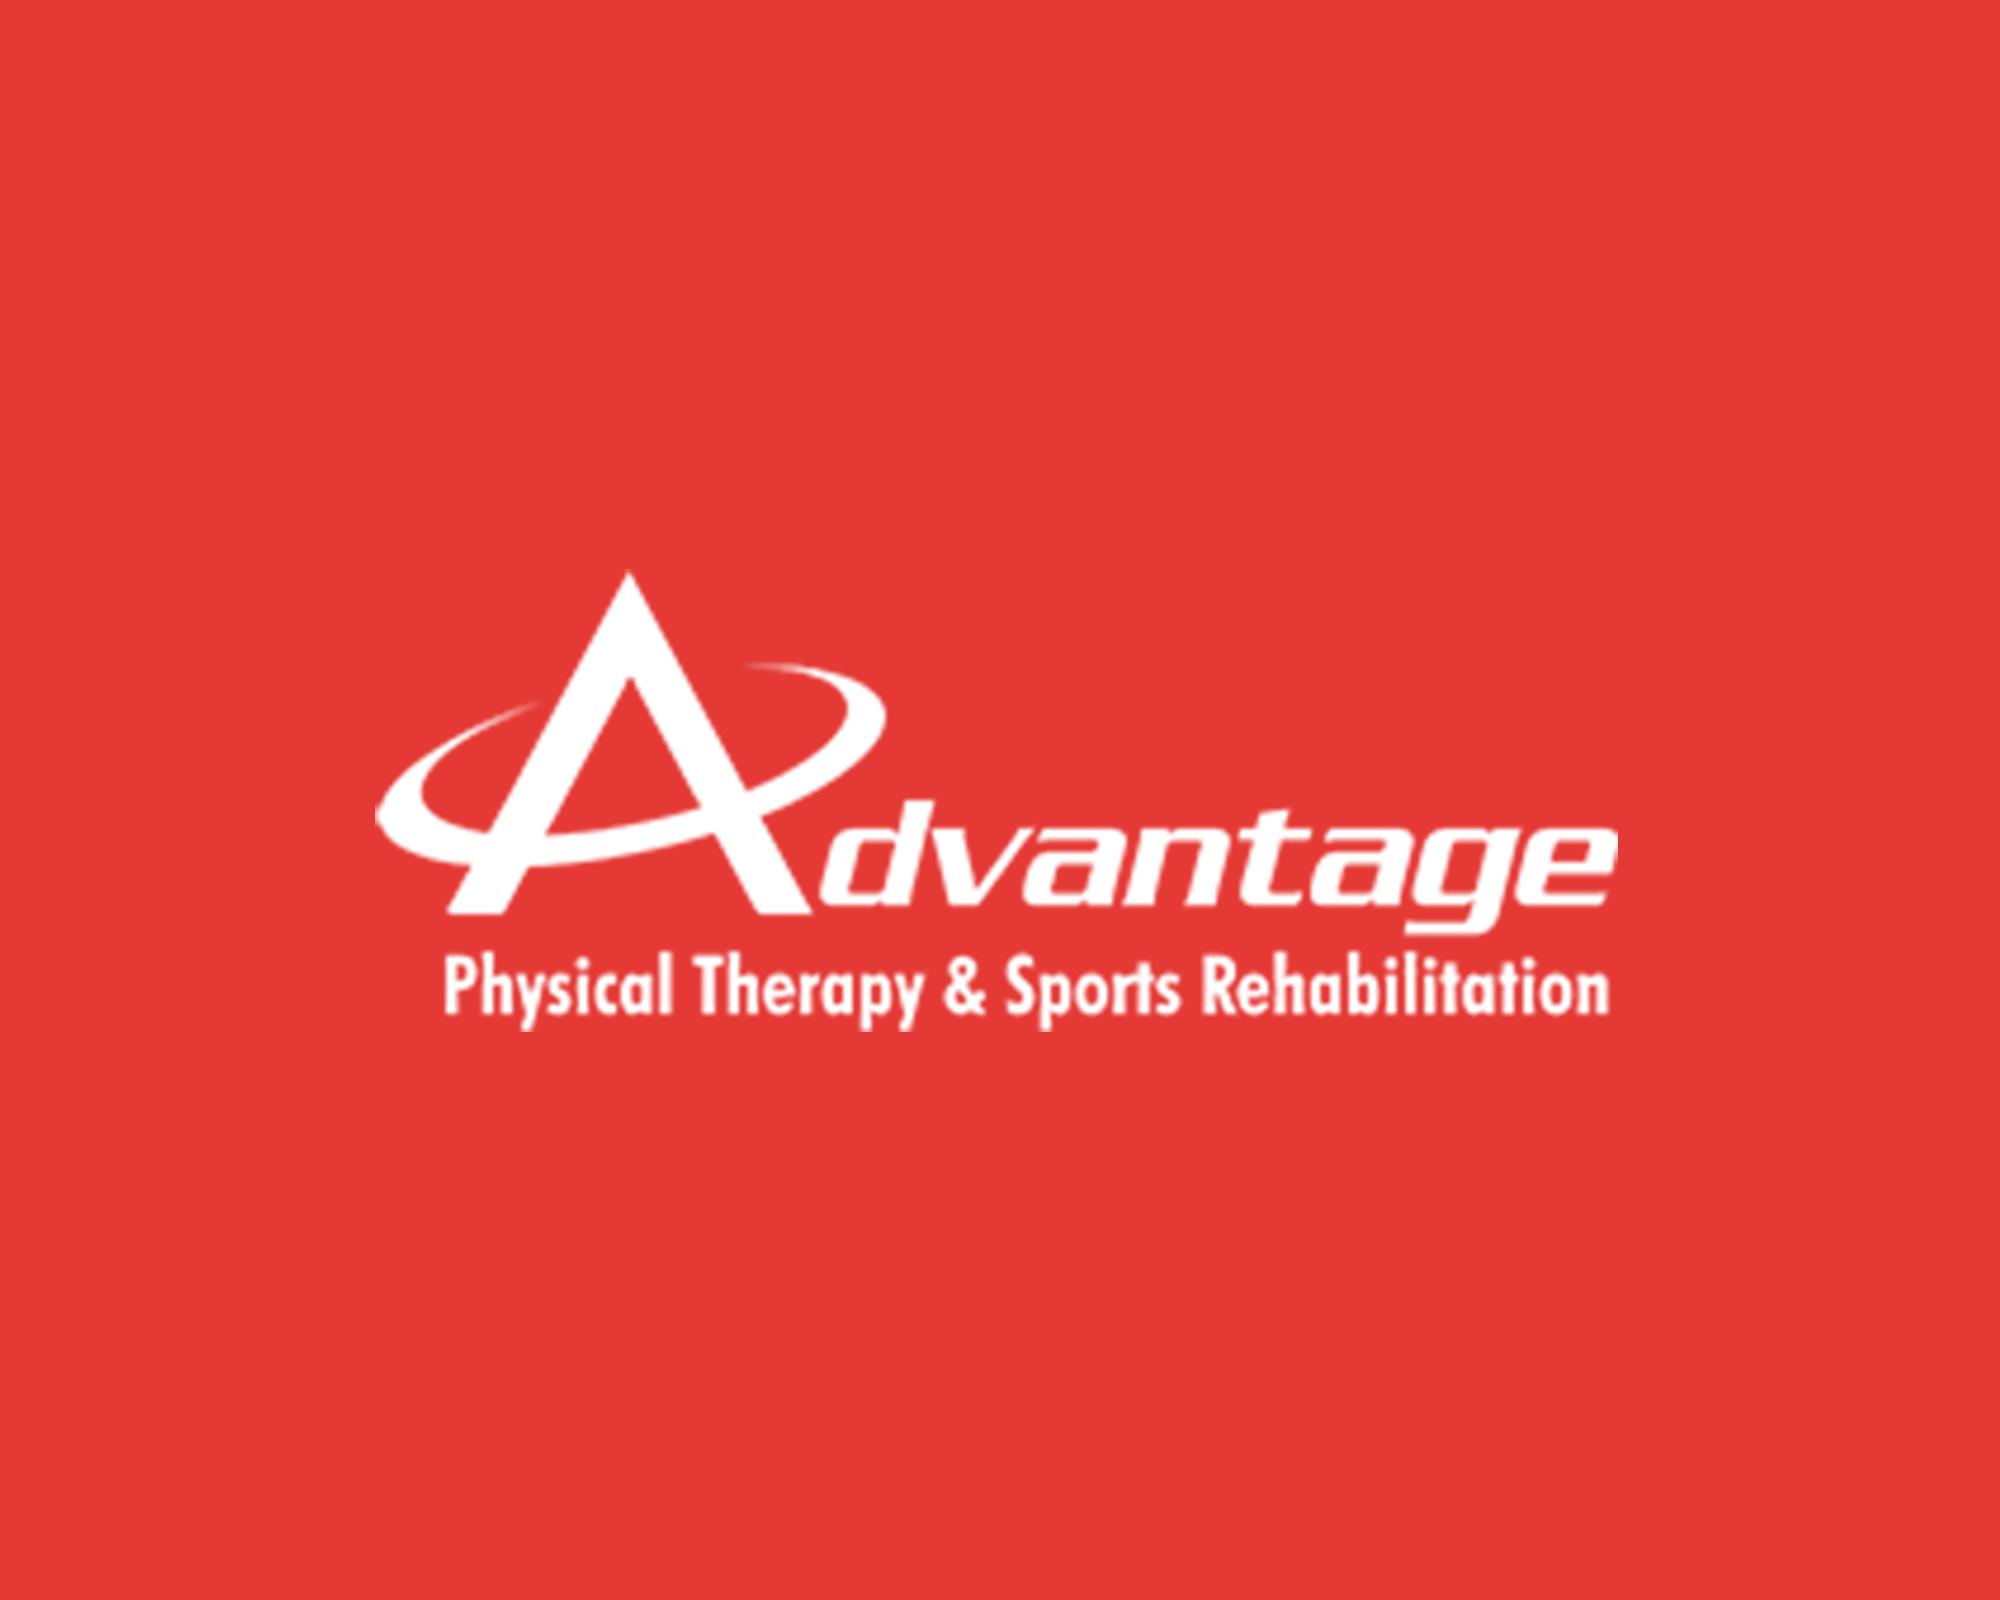 advantage physical therapy Logo